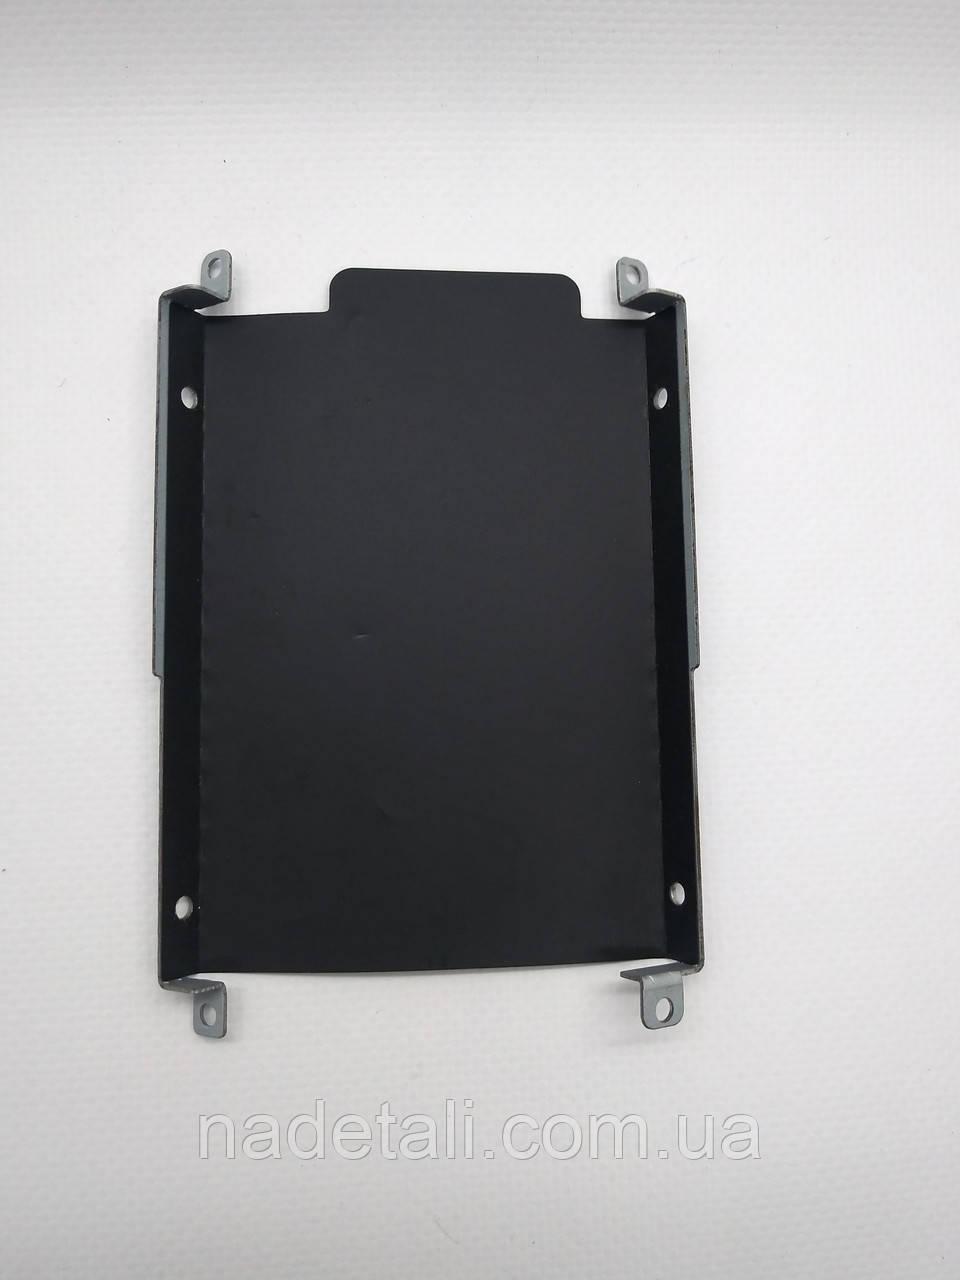 Корзина HDD Compaq Presario CQ56 FBAX6010010